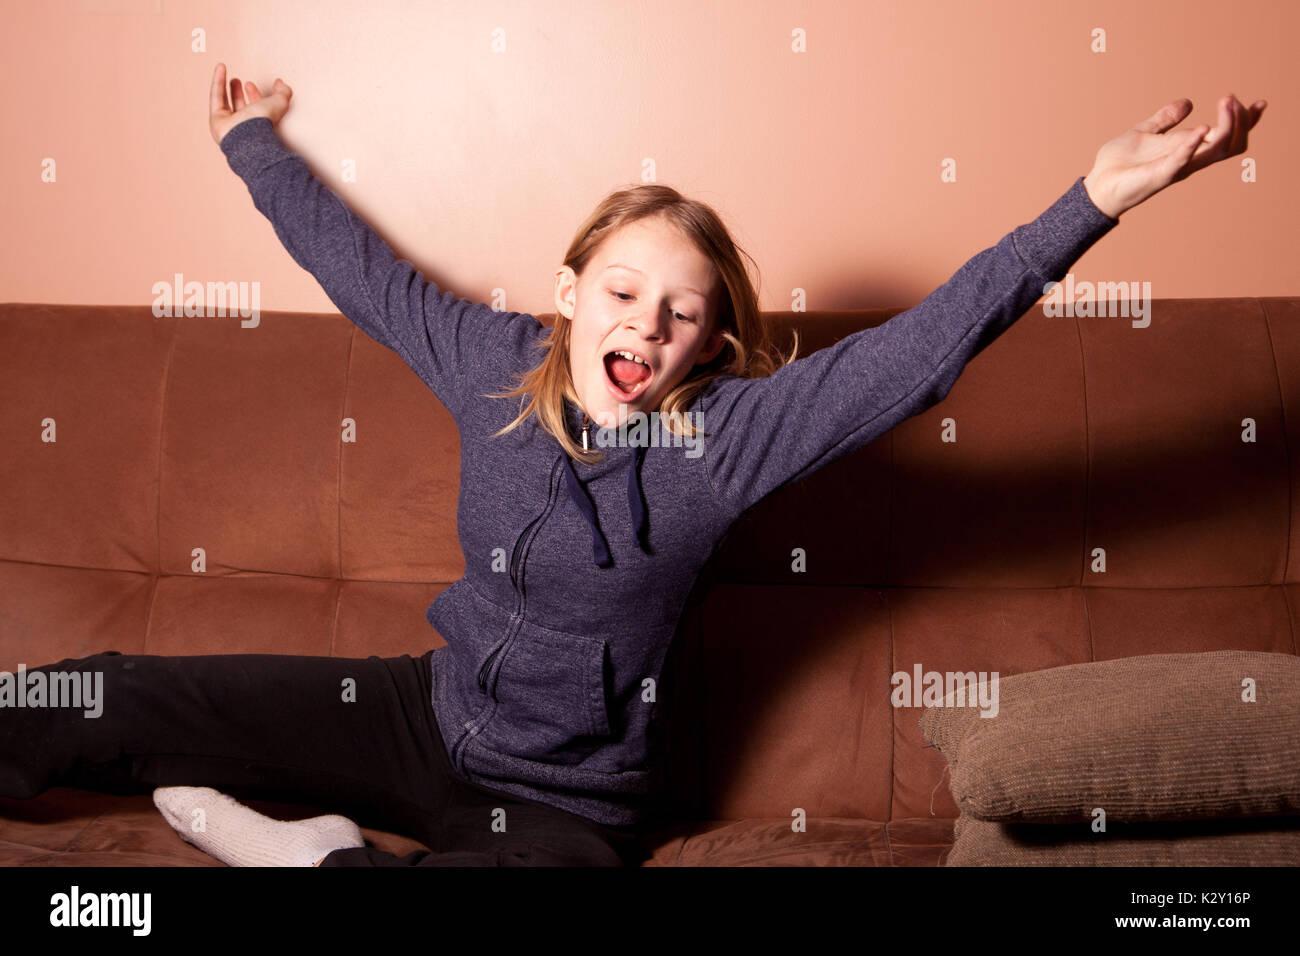 teenage girl with blond hair yawning - Stock Image